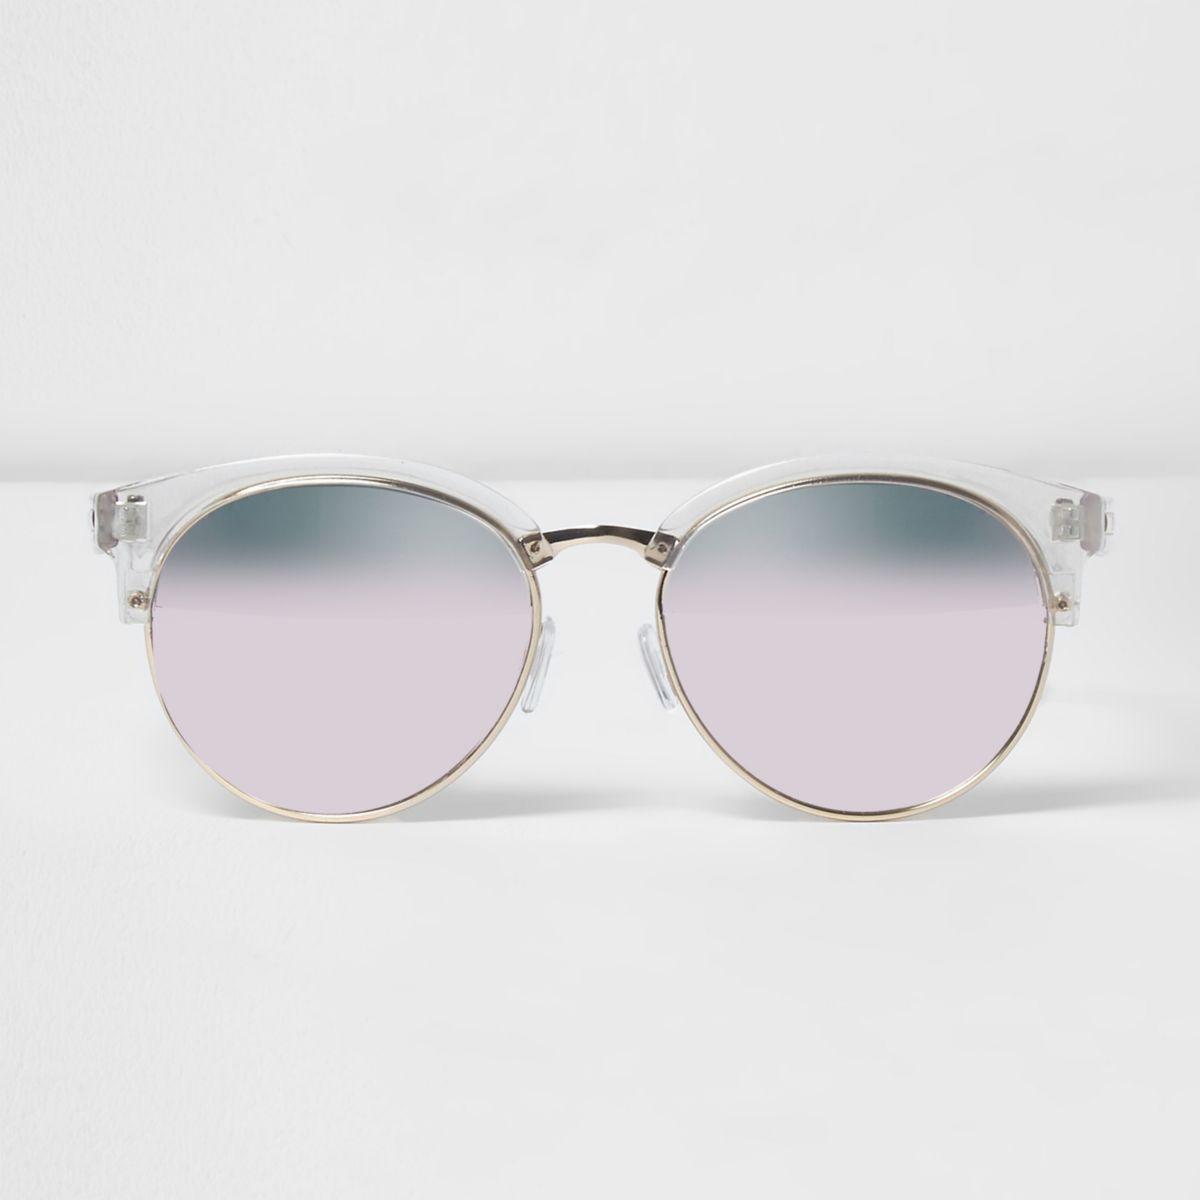 Clear half frame pink lens sunglasses